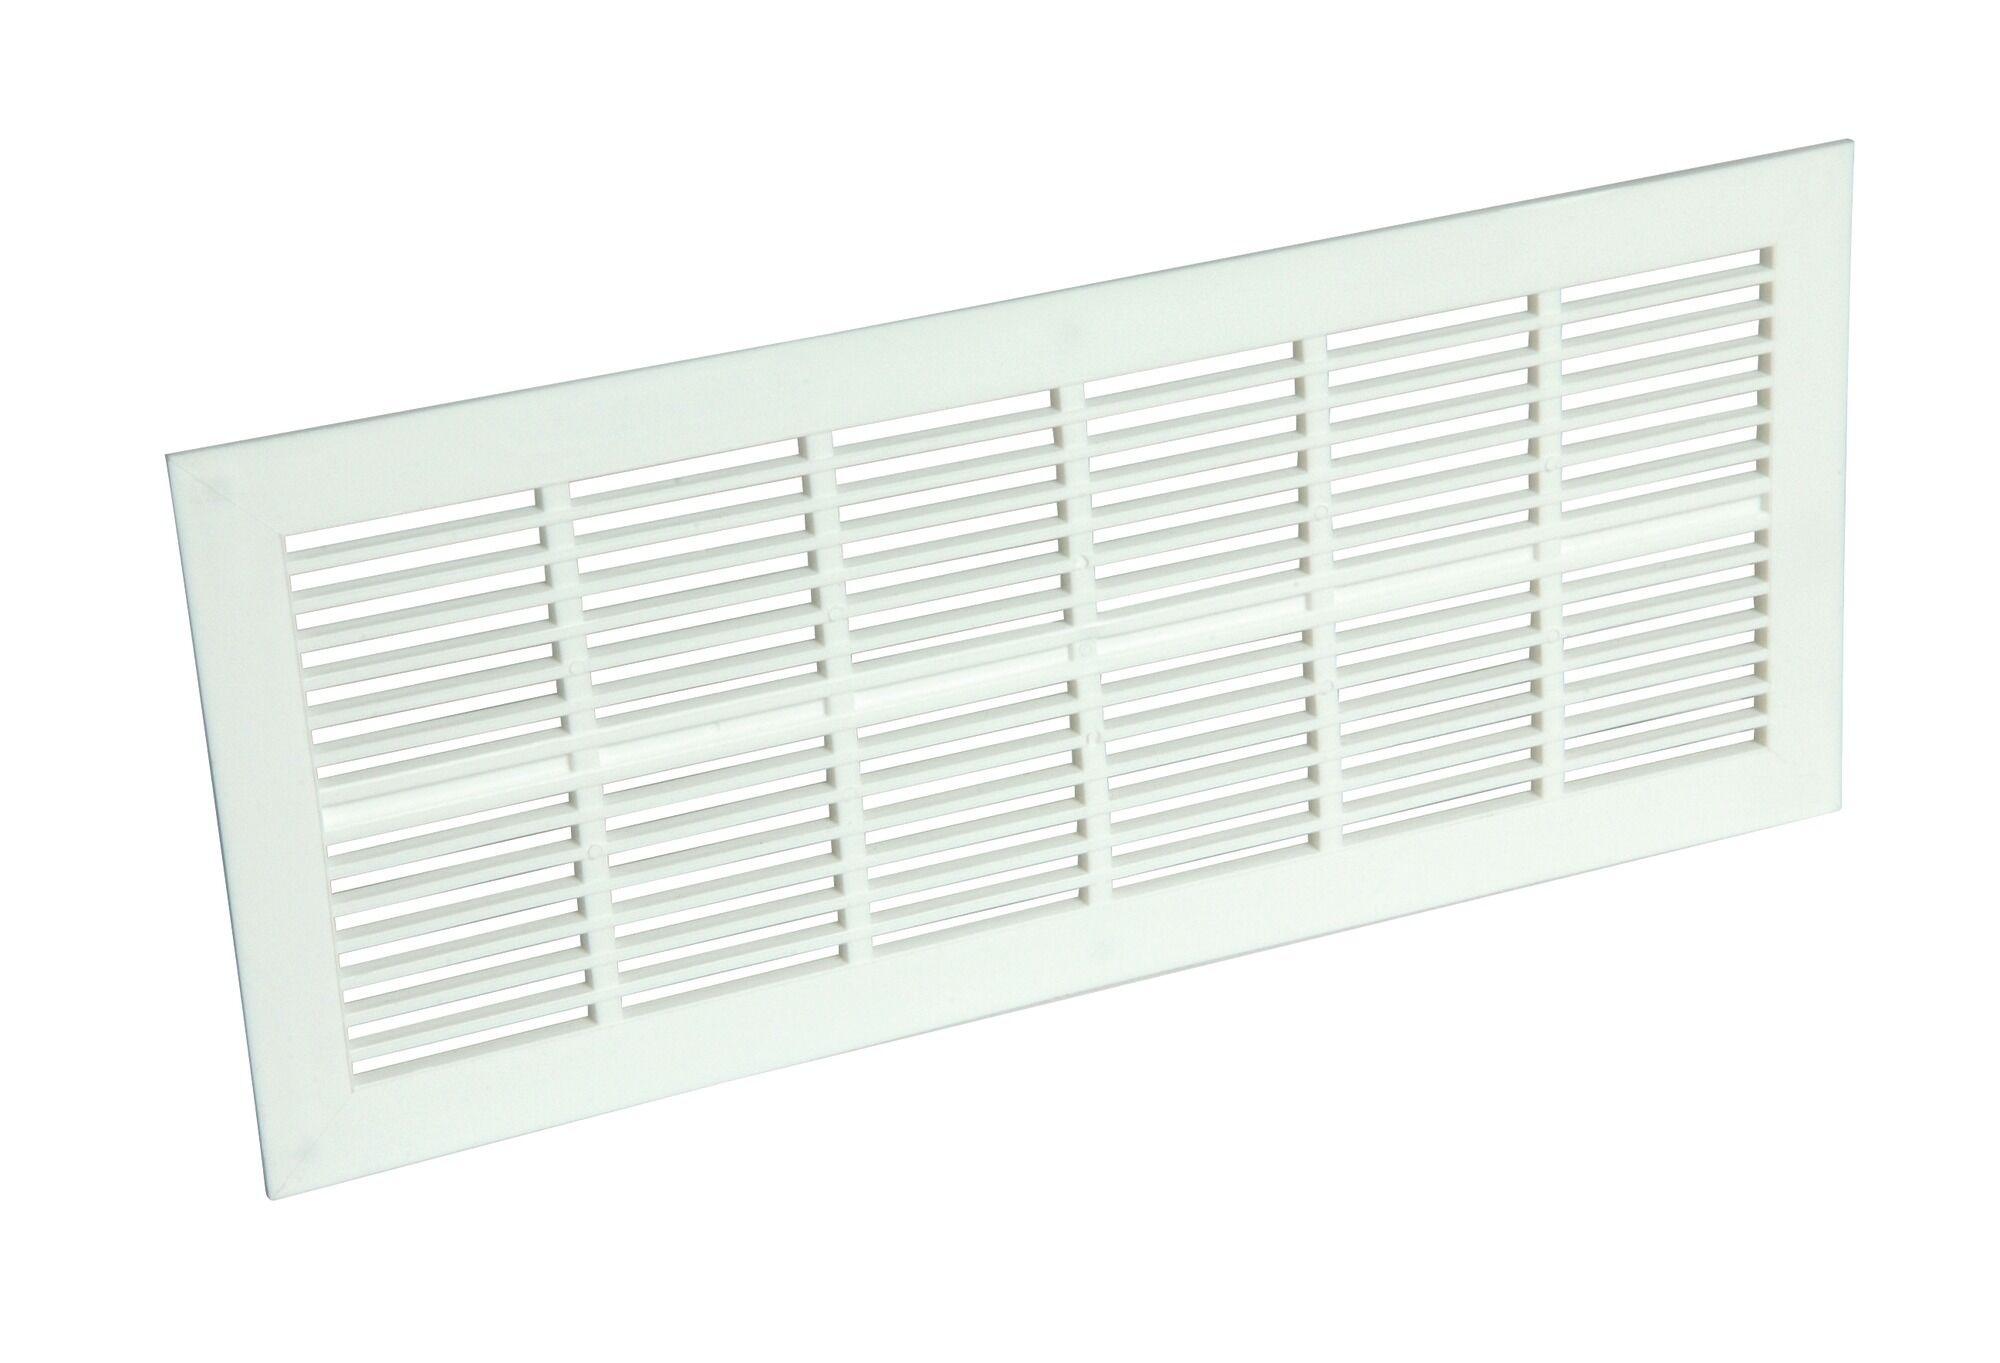 NICOLL Grille de ventilation en applique Type 100cm2 rectangulaire extra-plate 54x230 mm - NICOLL - 1PB101